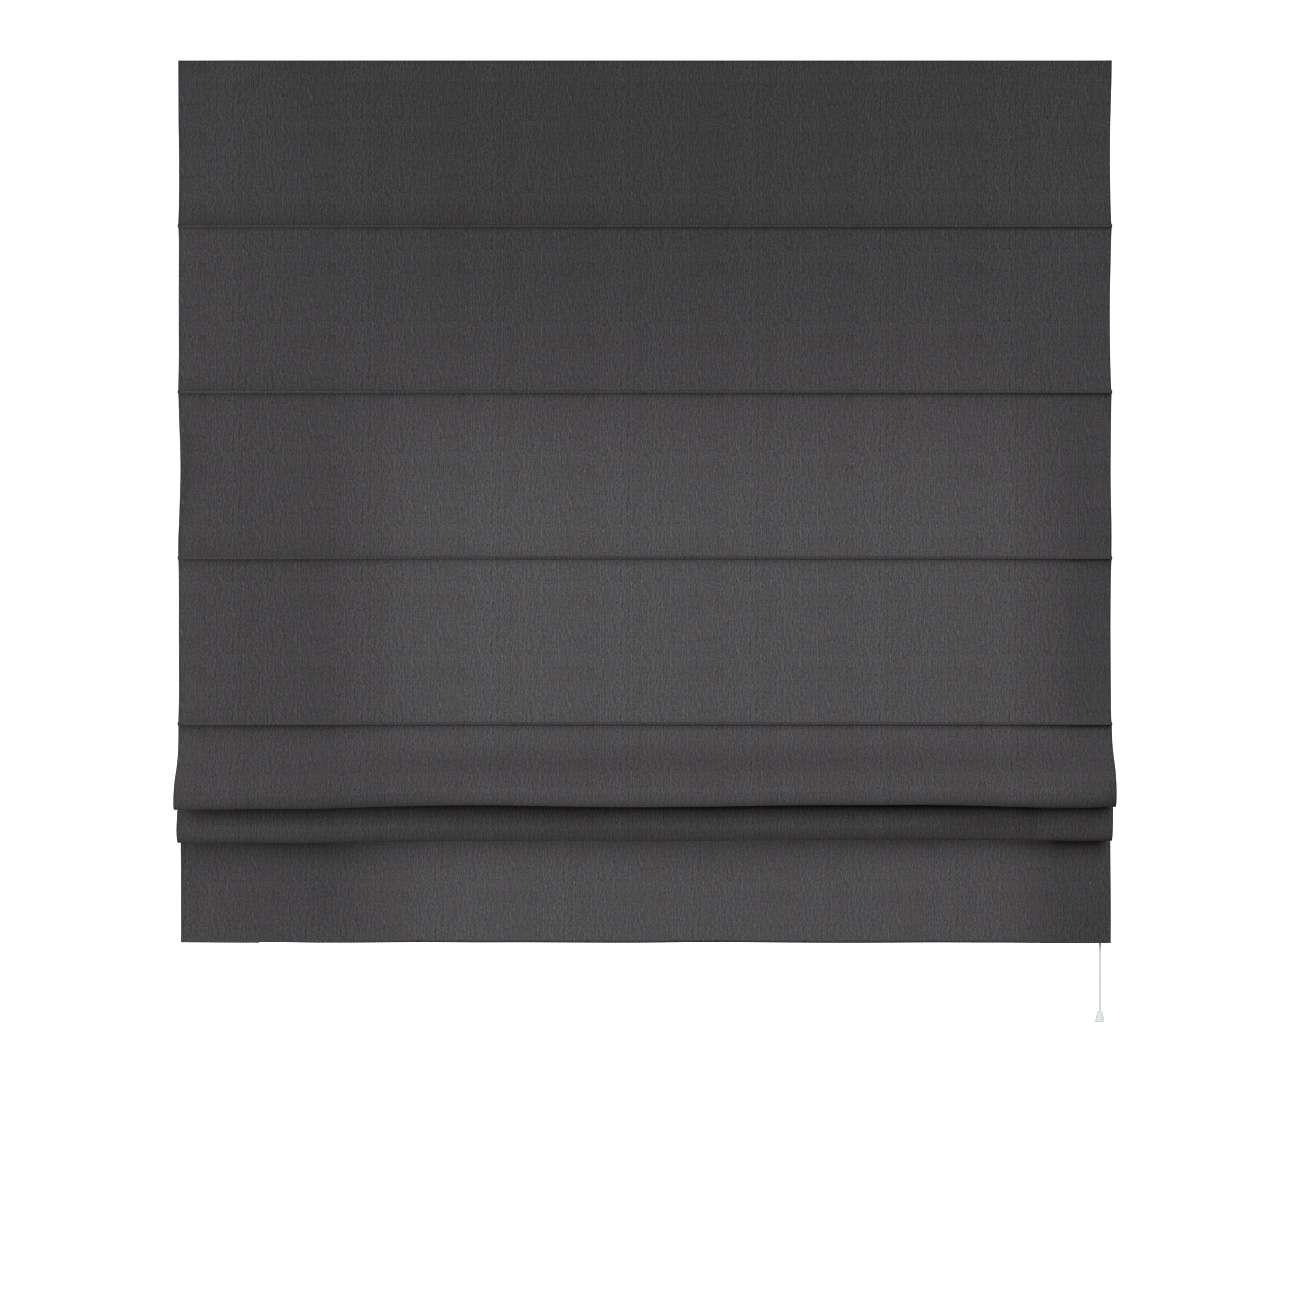 Padva roman blind  80 x 170 cm (31.5 x 67 inch) in collection Chenille, fabric: 702-20